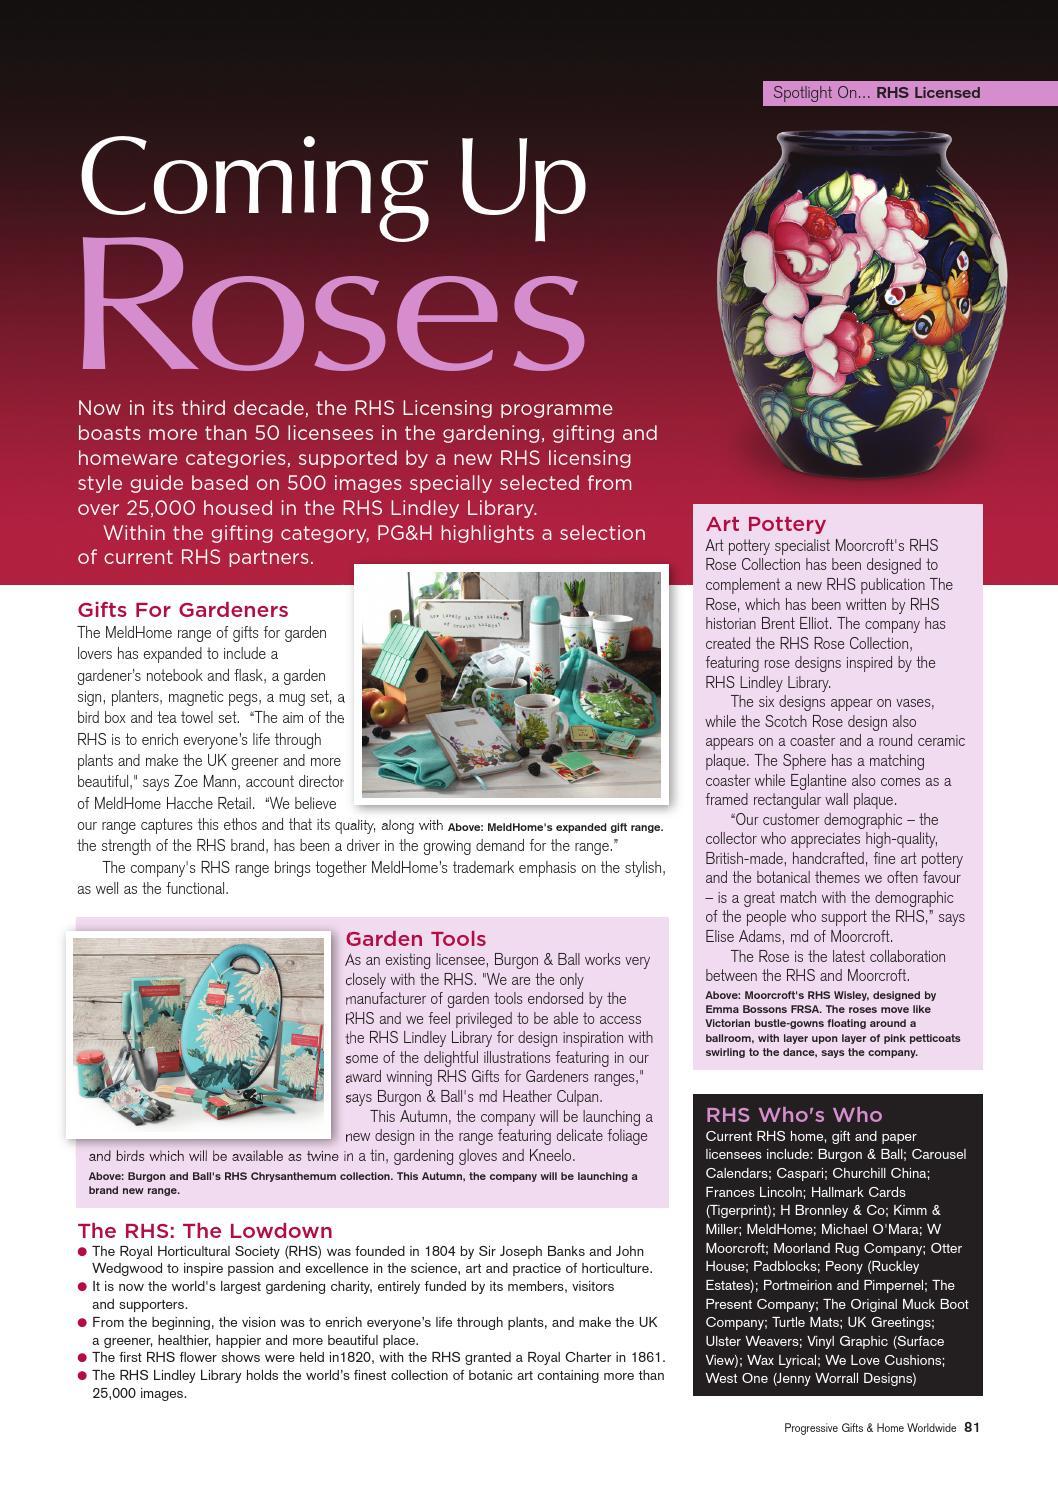 Progressive Gifts \u0026 Home - September 2016 by Max Publishing - issuu